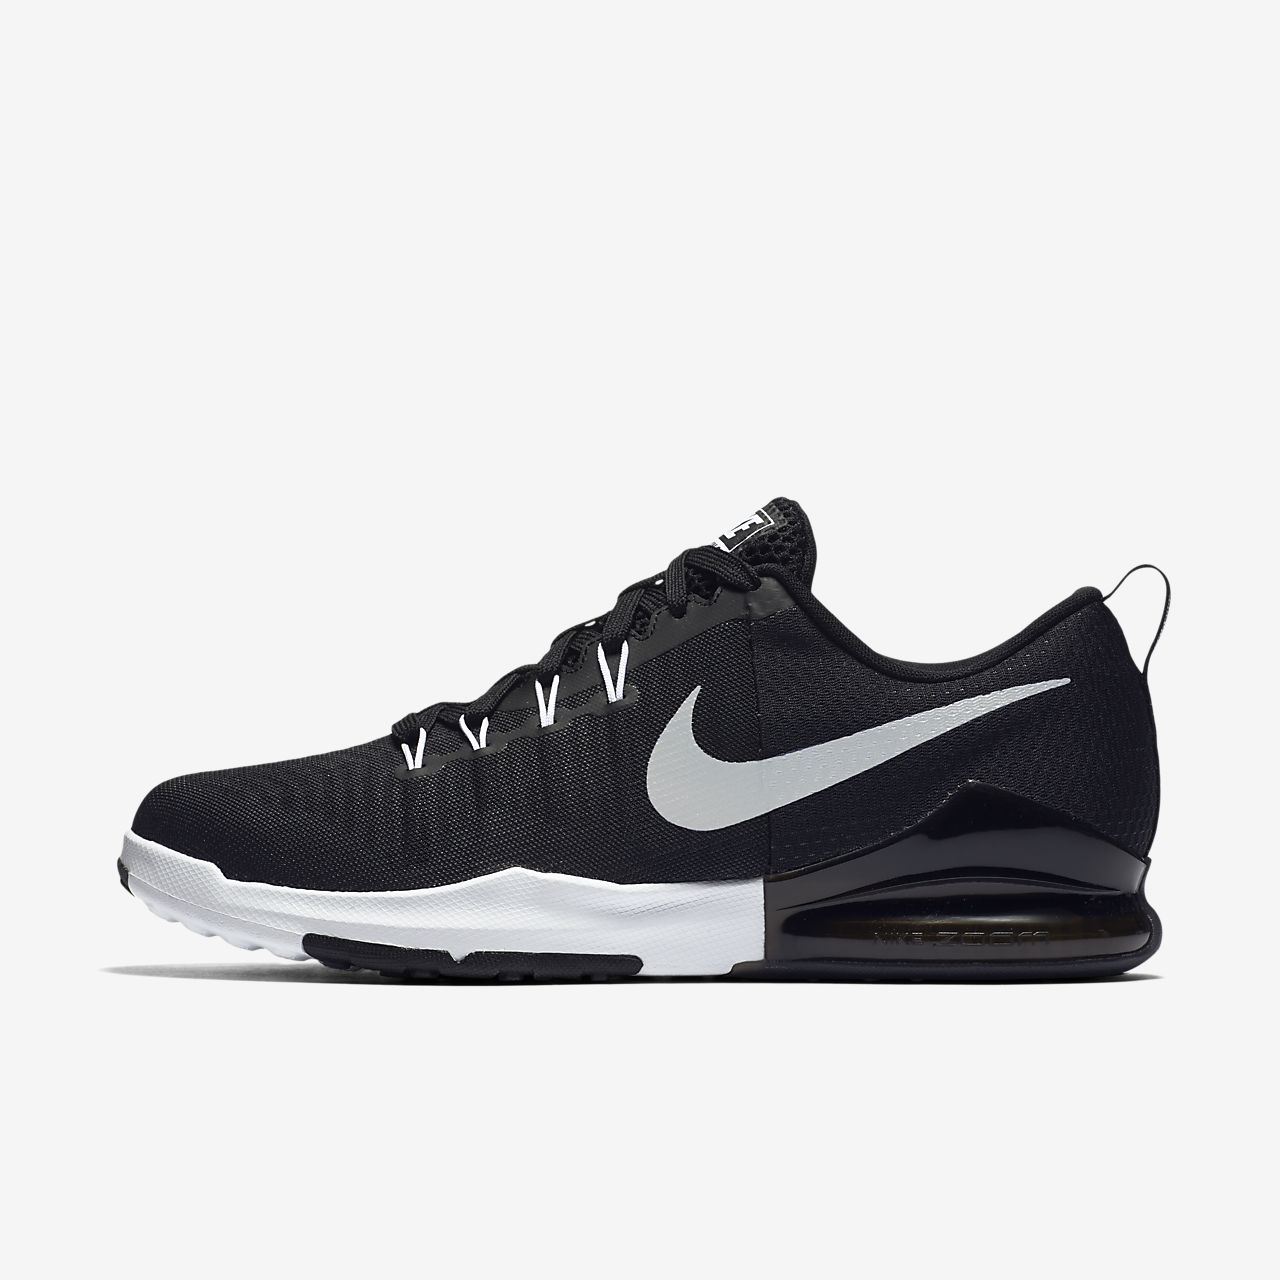 Nike Chaussure Zoom Train noir - Livraison Gratuite avec  - Chaussures Chaussures-de-running Femme